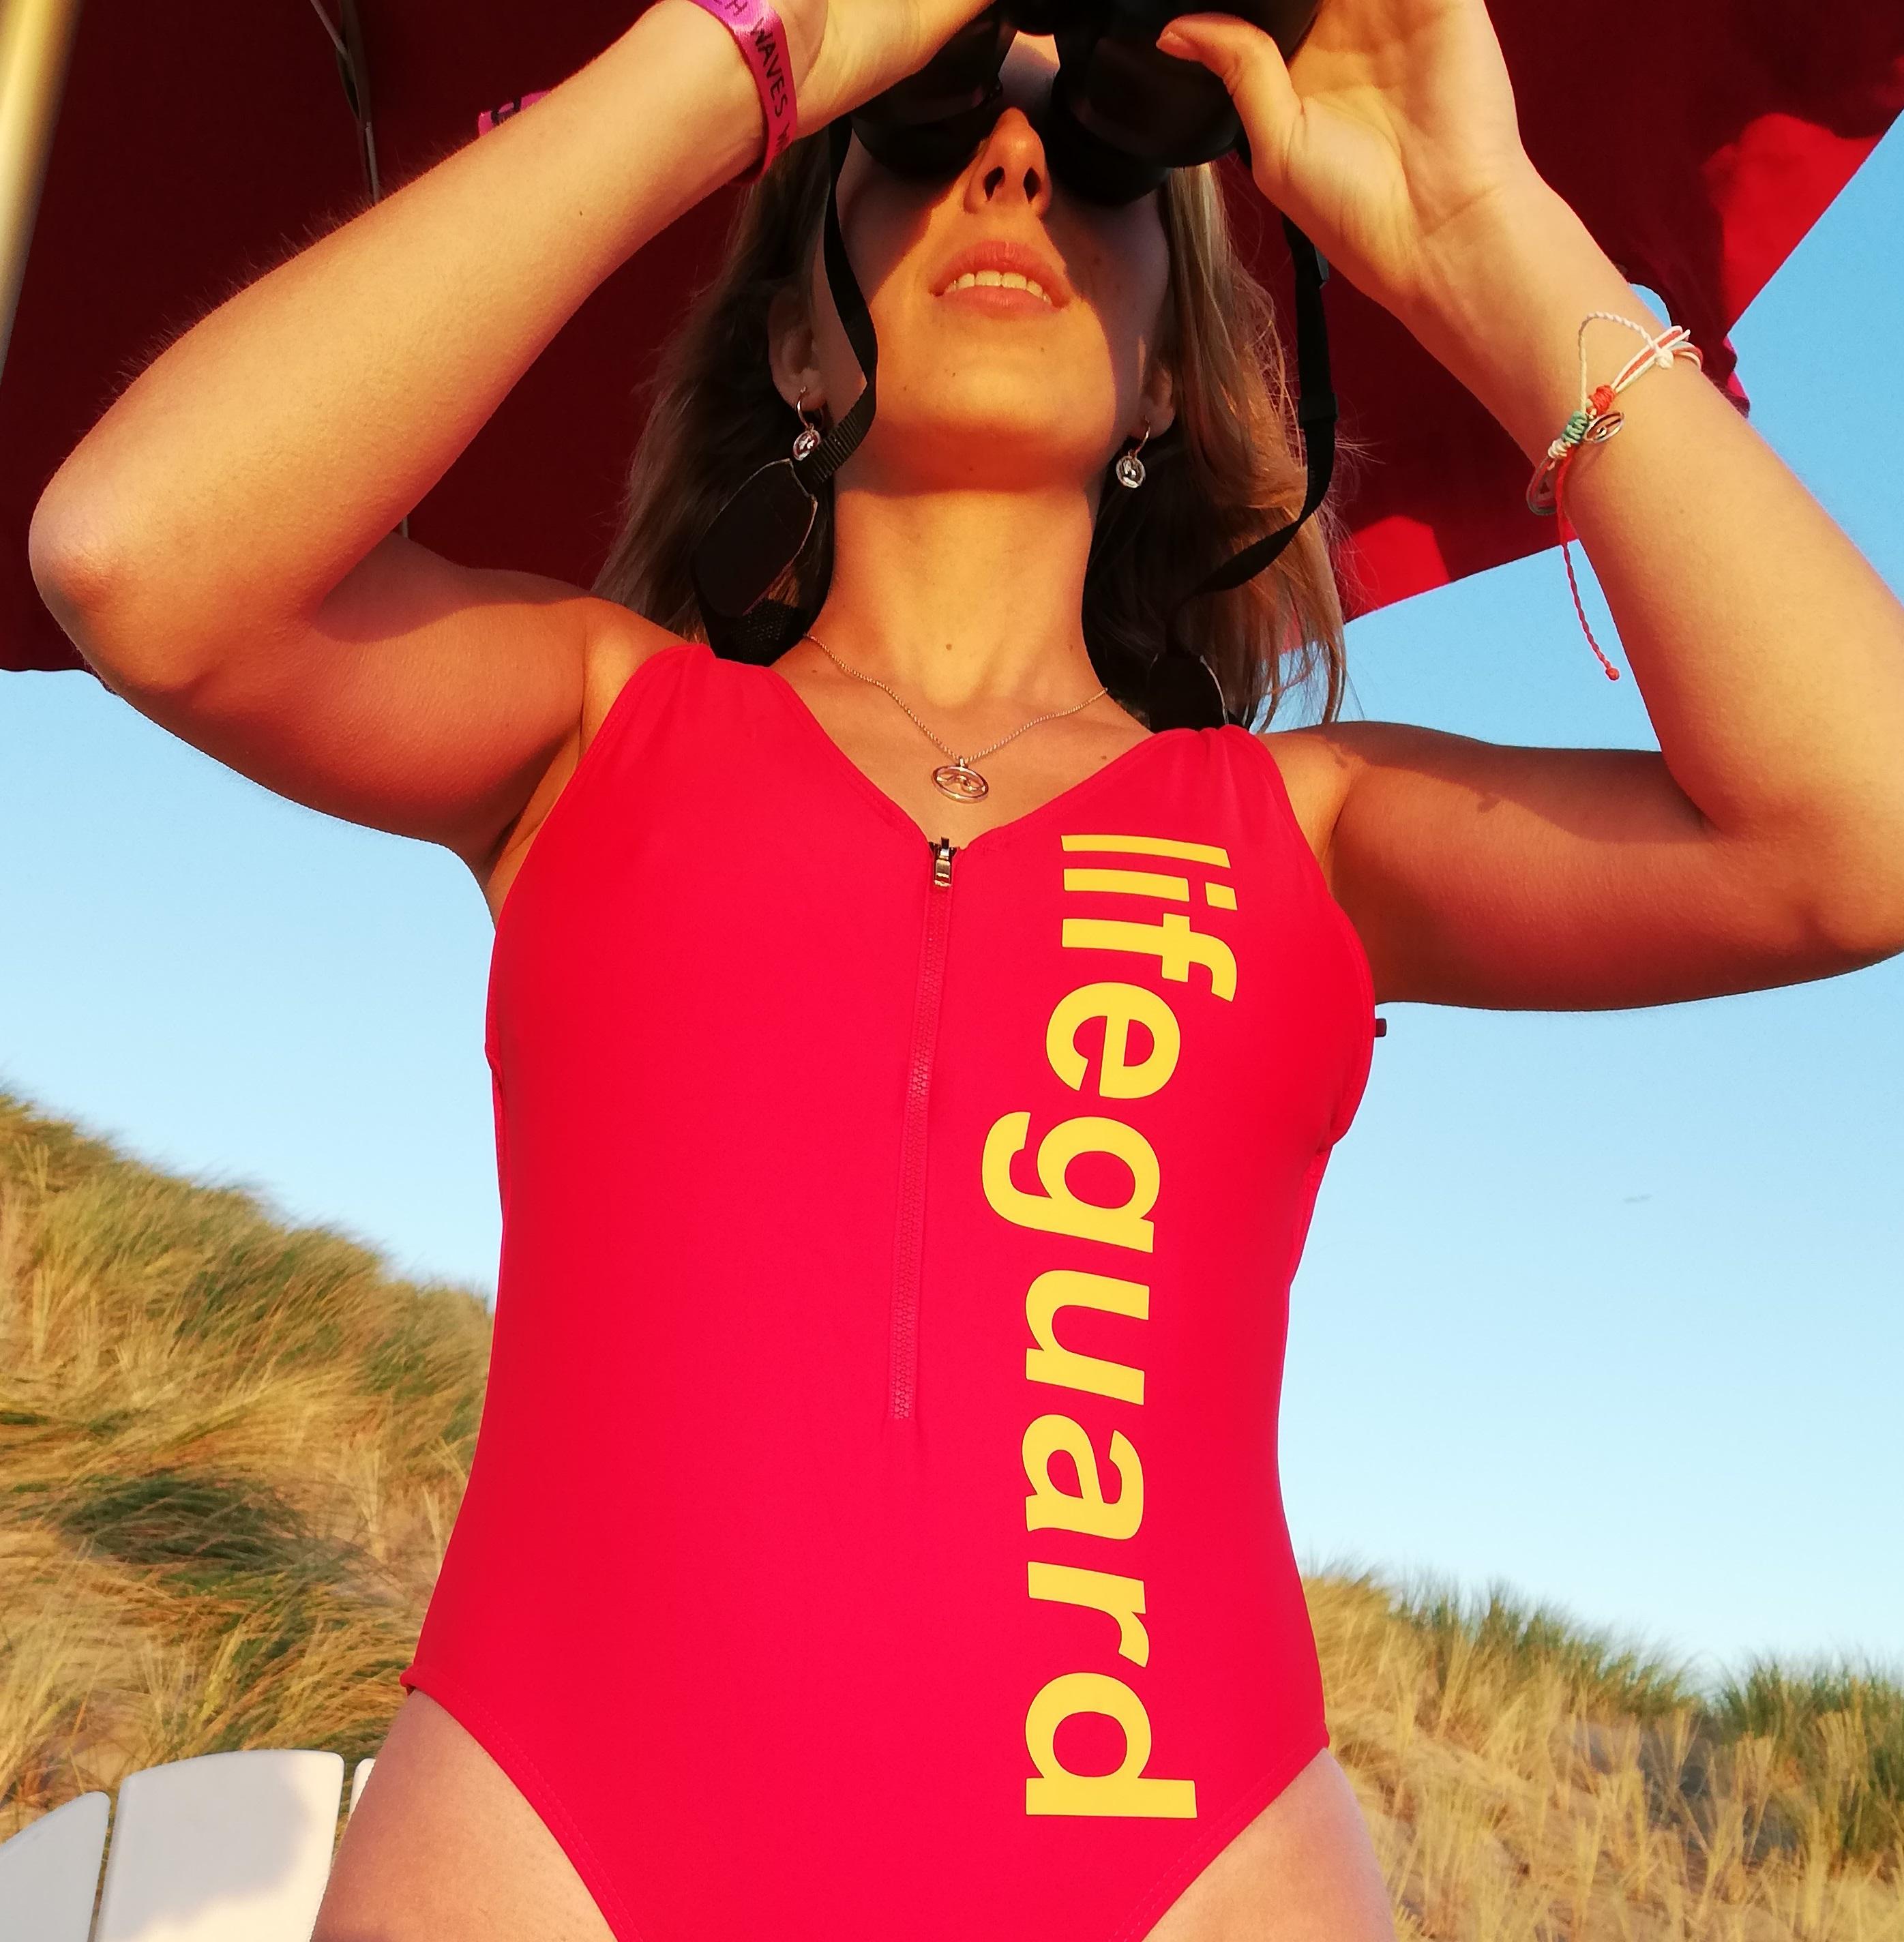 Baywatch Badpak Kopen.Lifeguard Badpak Met Rits Lifesaving Shop